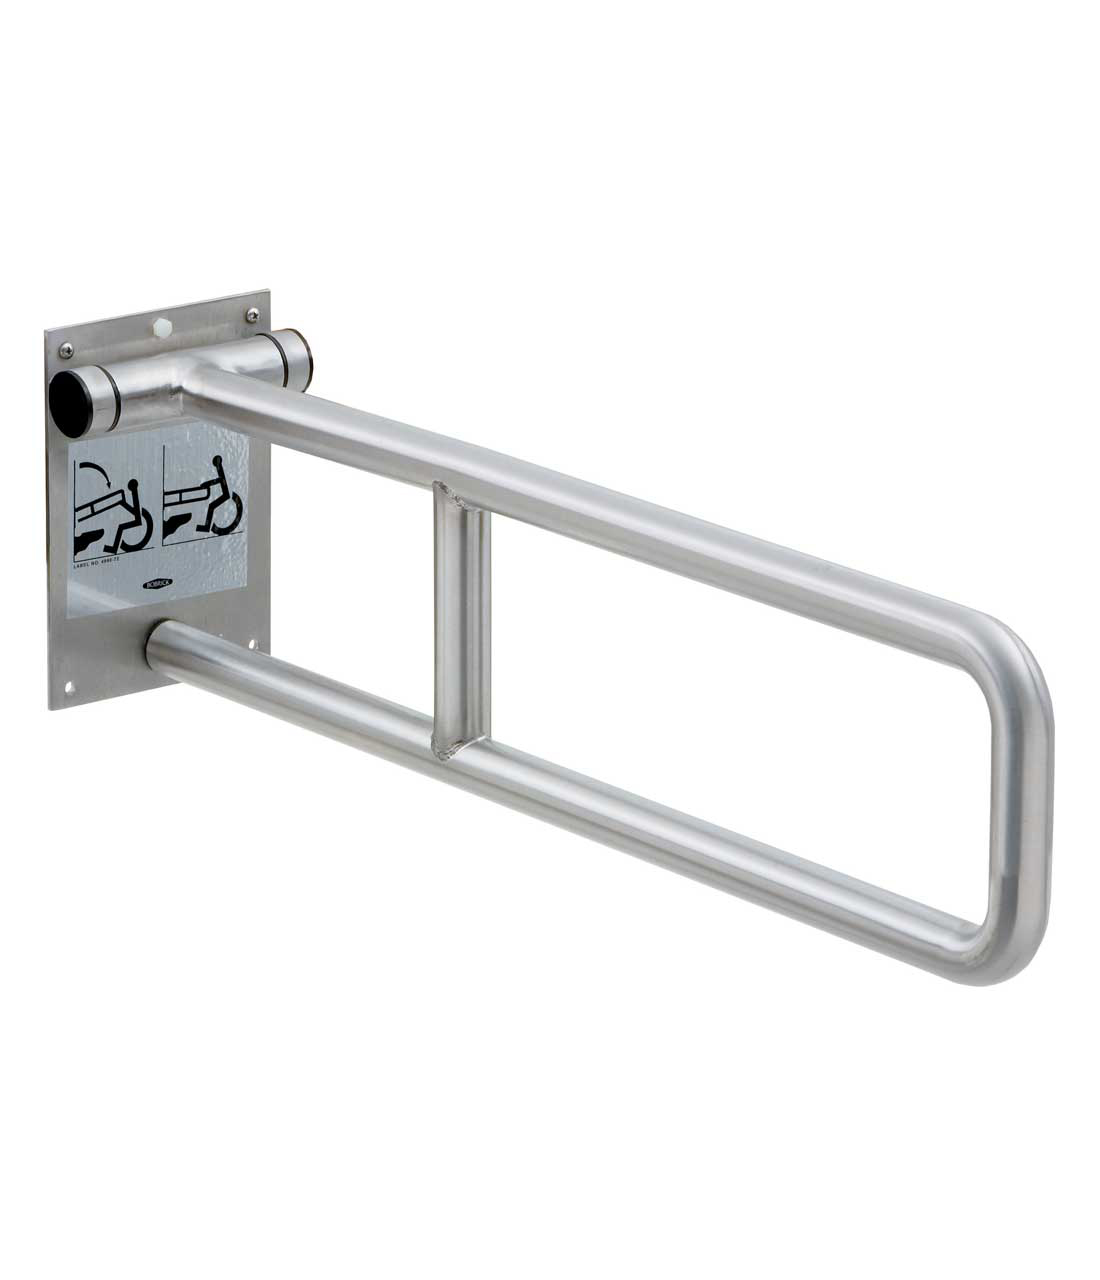 Bobrick B 4998 99 Swing Up Wall Mounted Grab Barbobrick B 4998 99 Grab Bar Swing Up